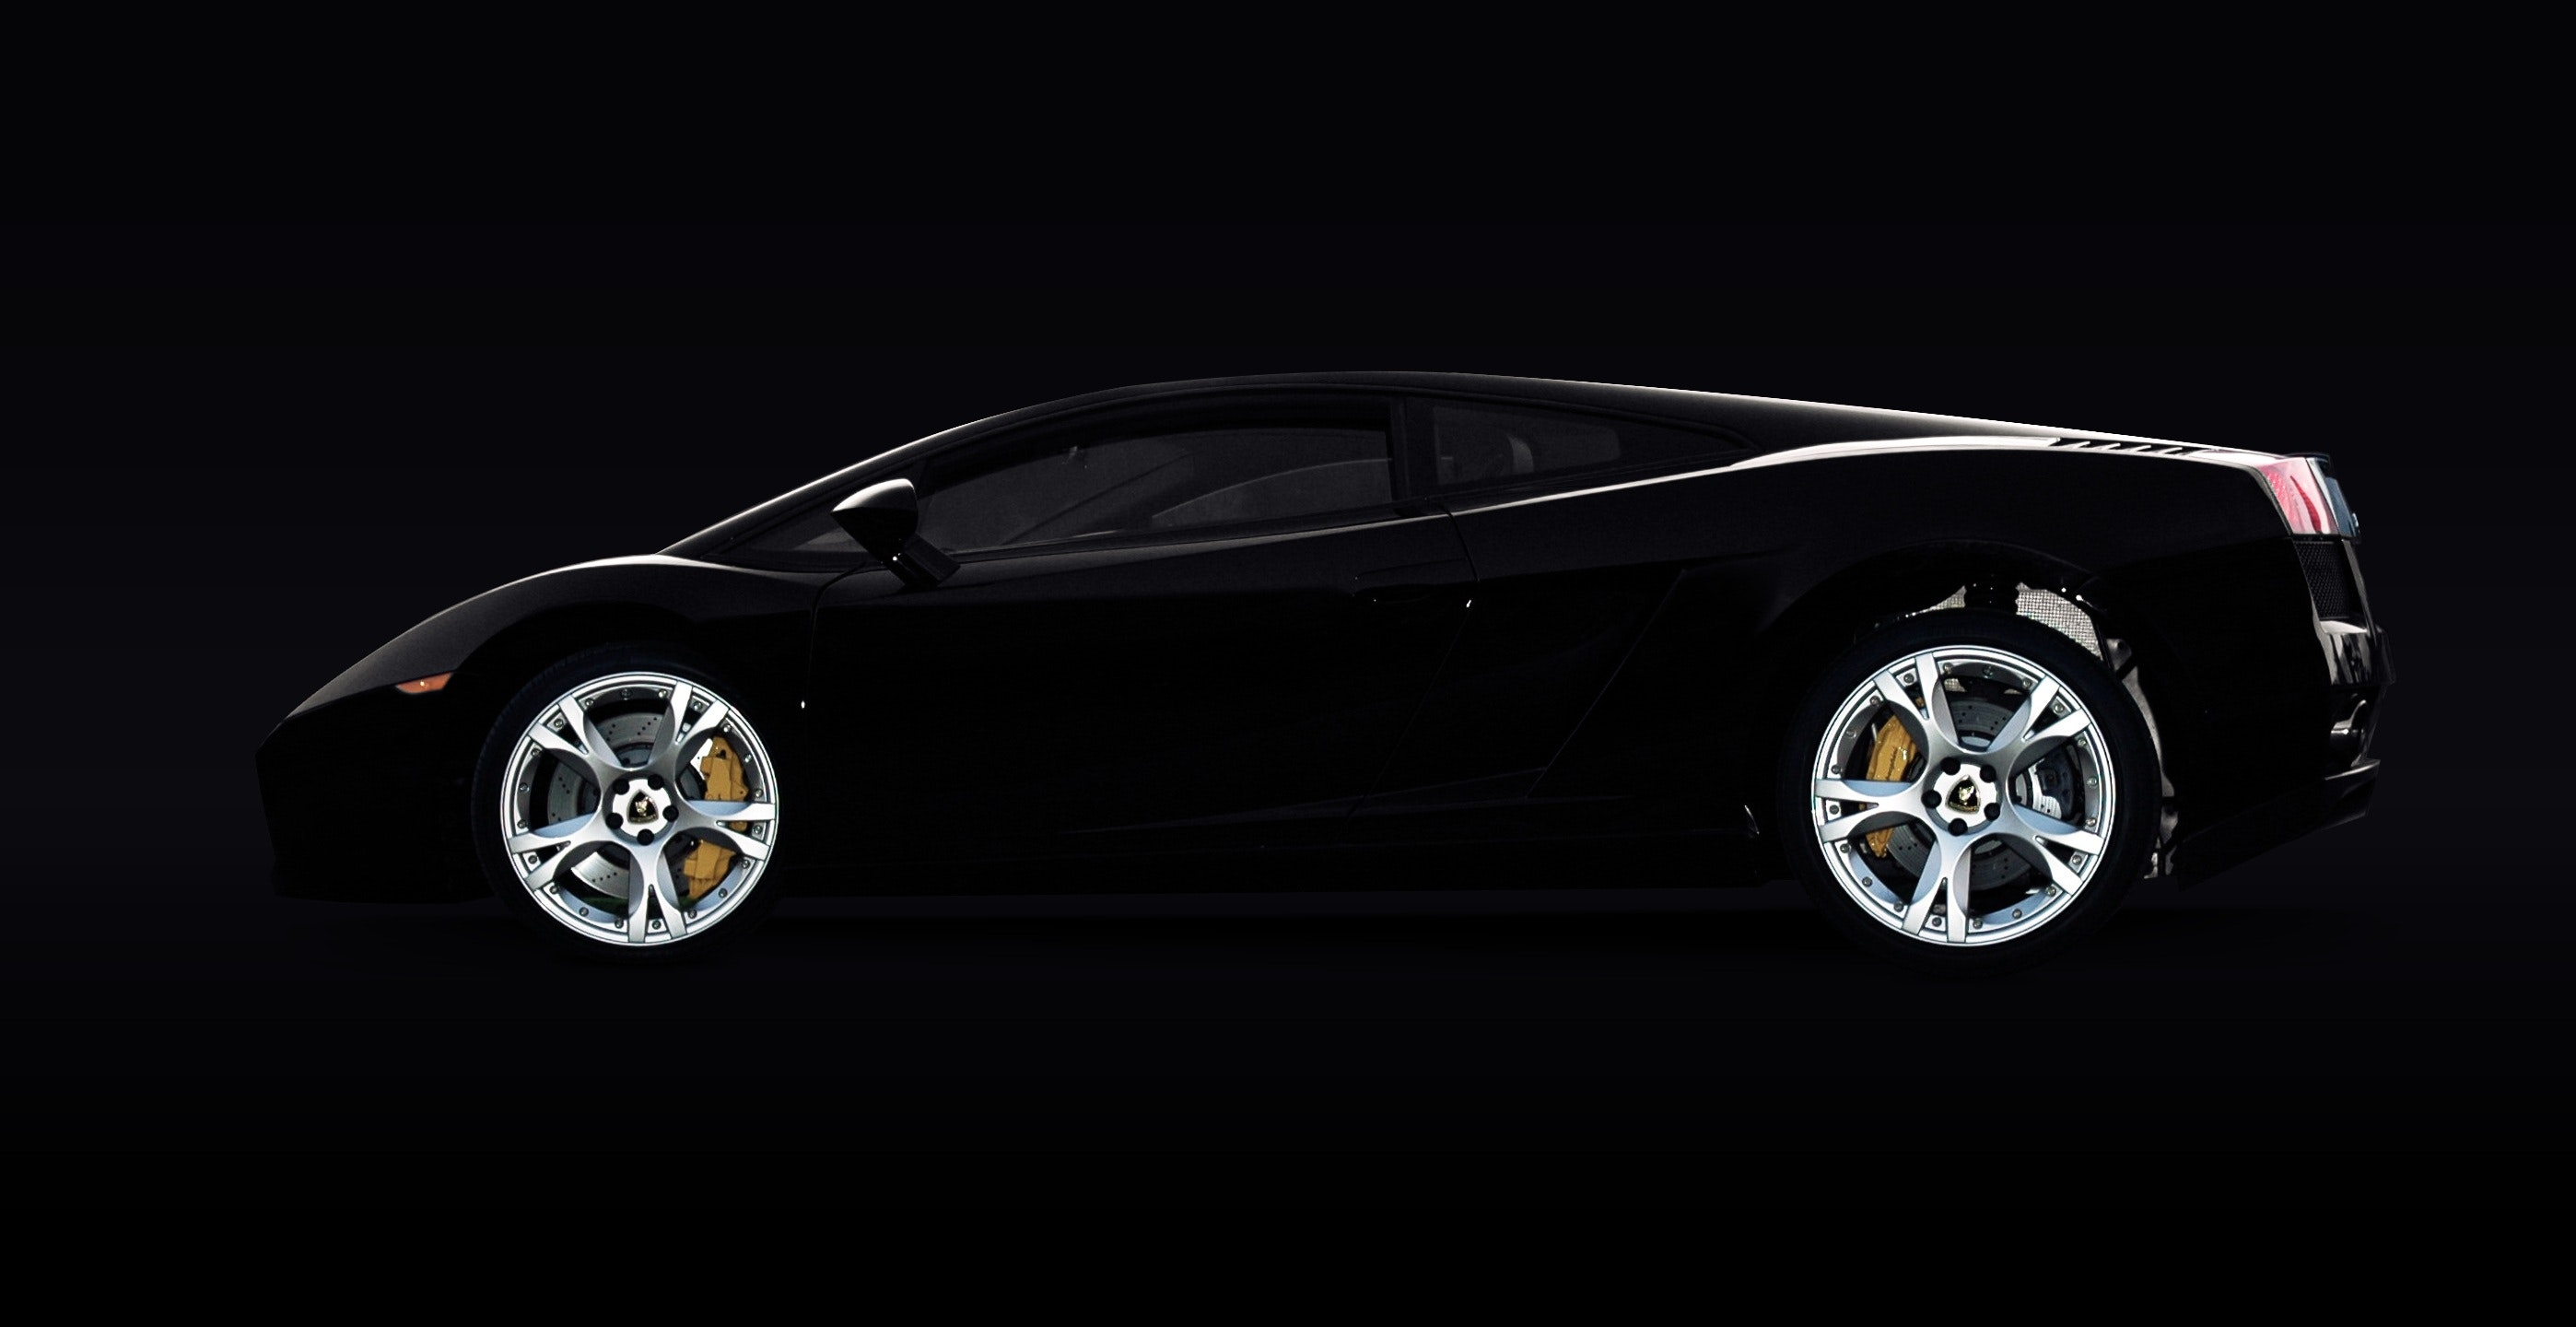 Black Lamborghini Murcielago, Racing car, Luxury, Rims, Side view, HQ Photo